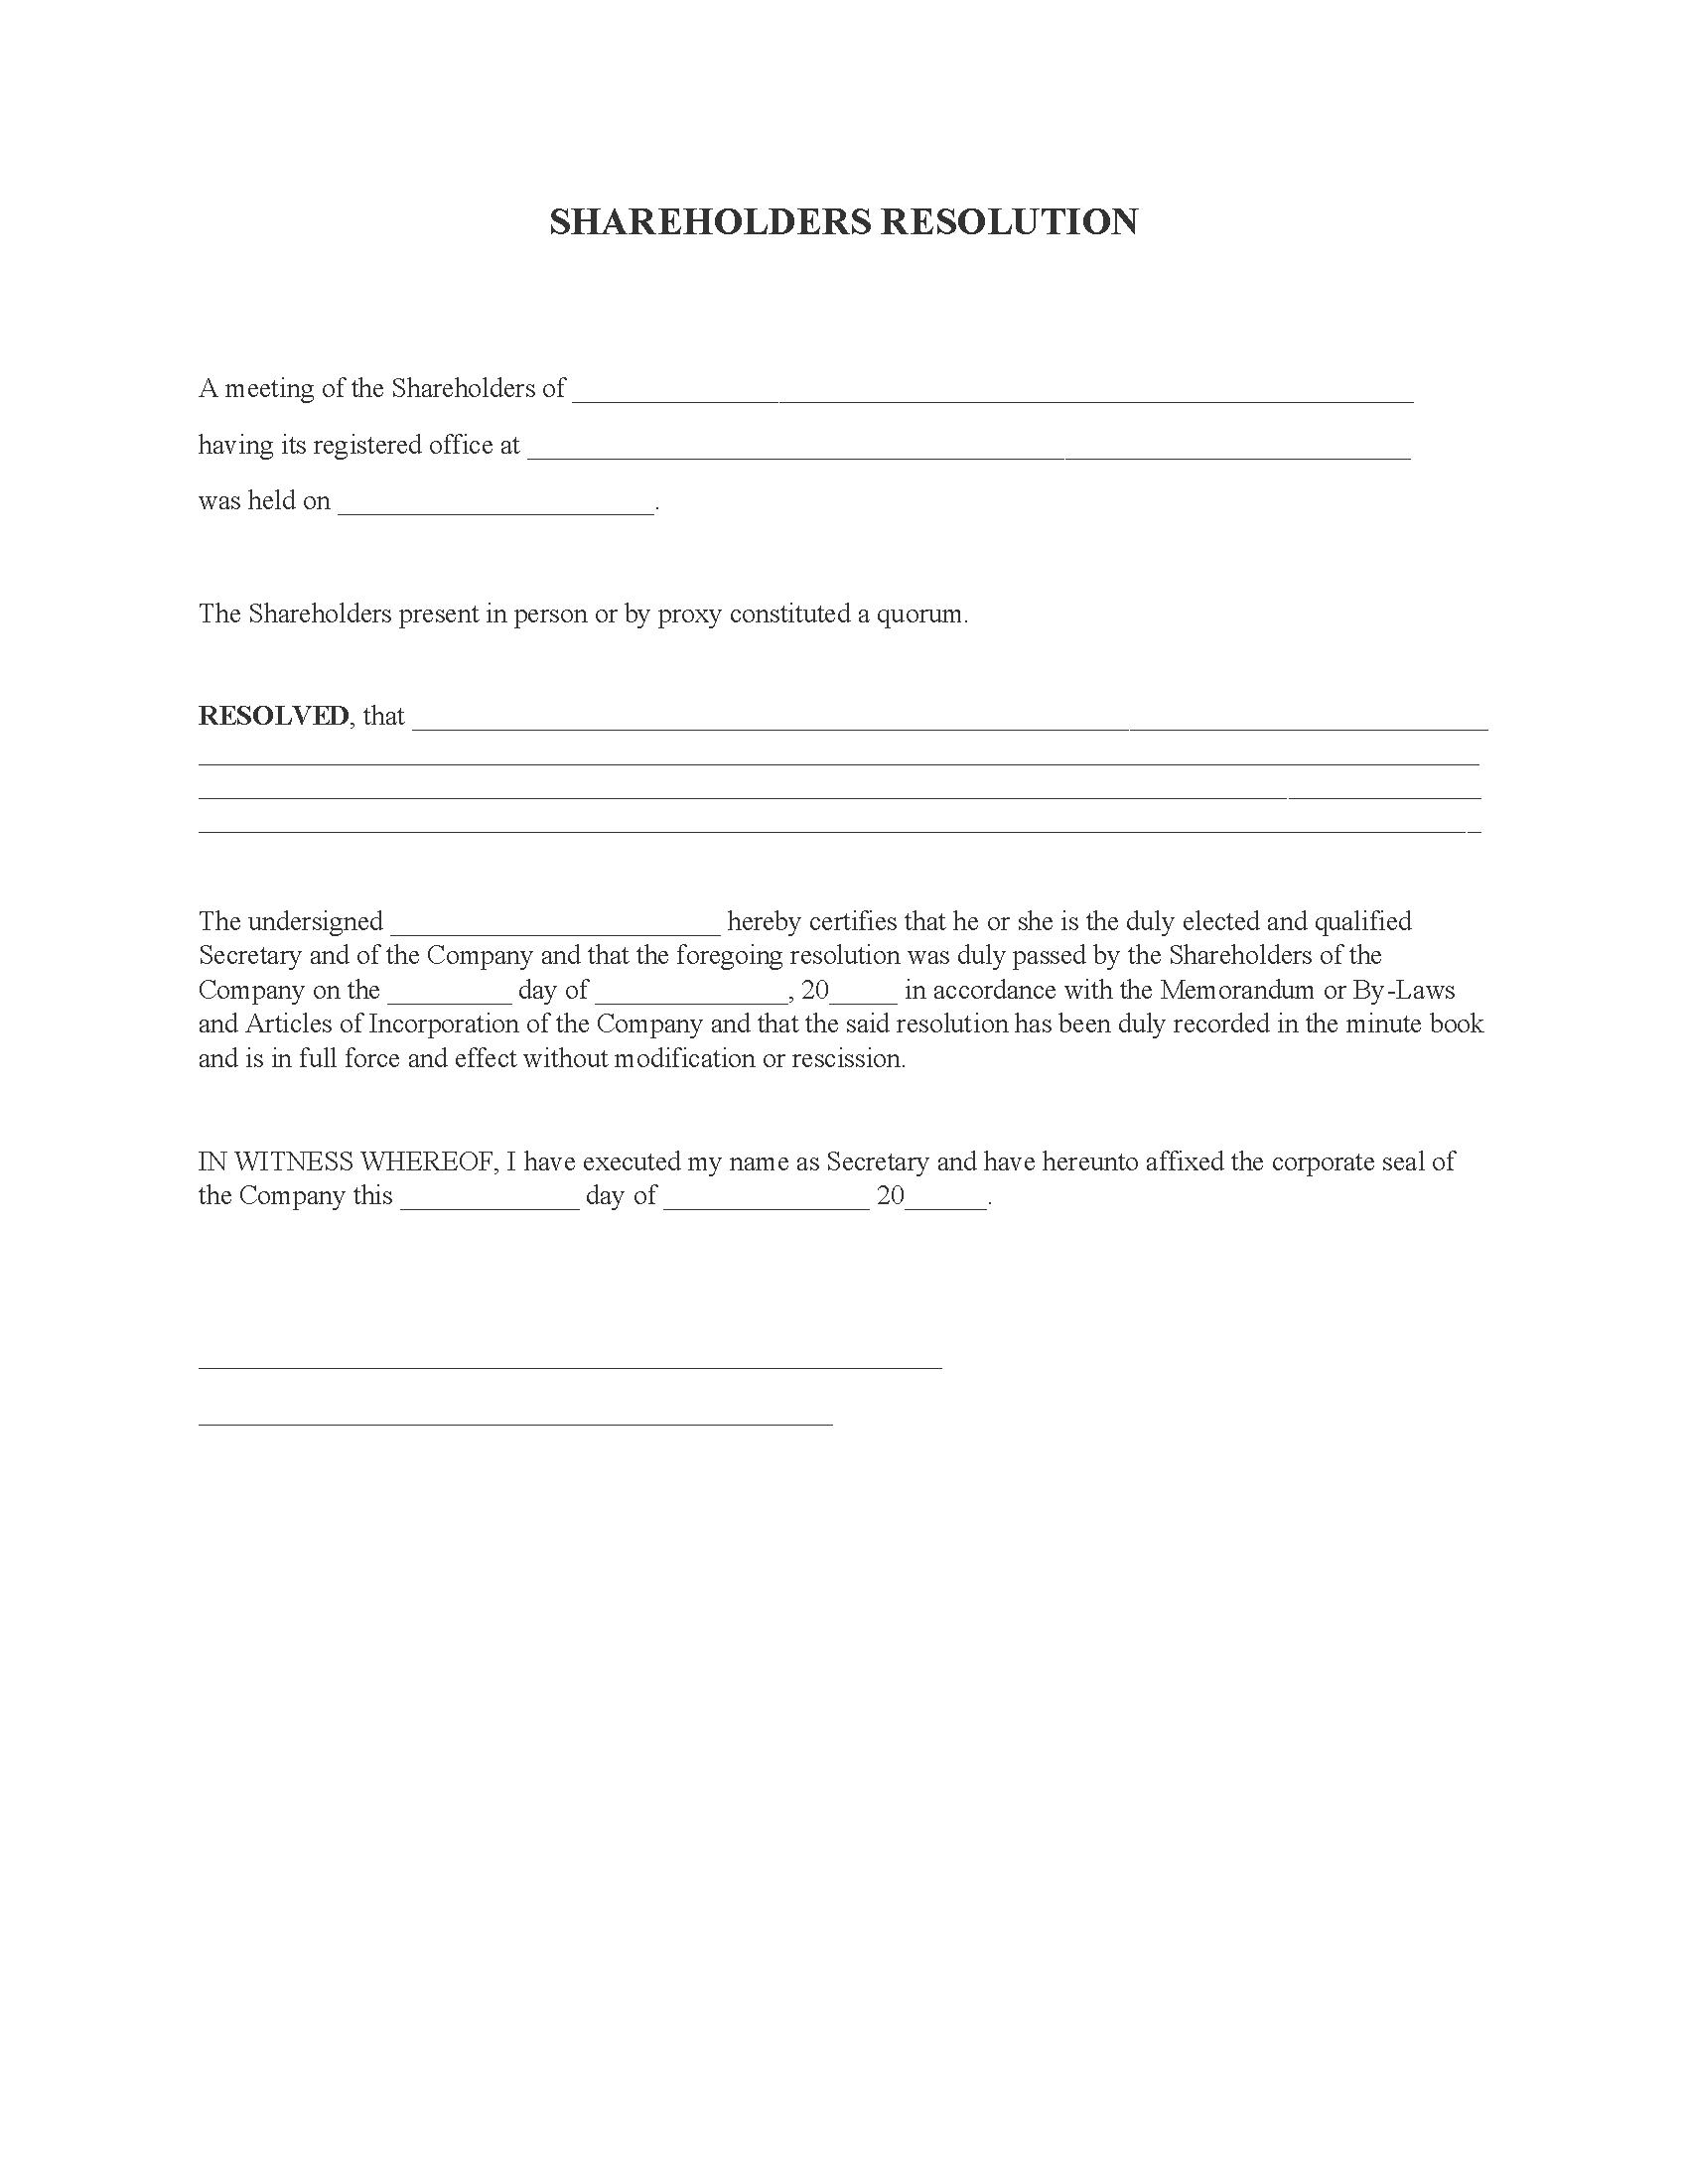 Shareholders Resolution Form